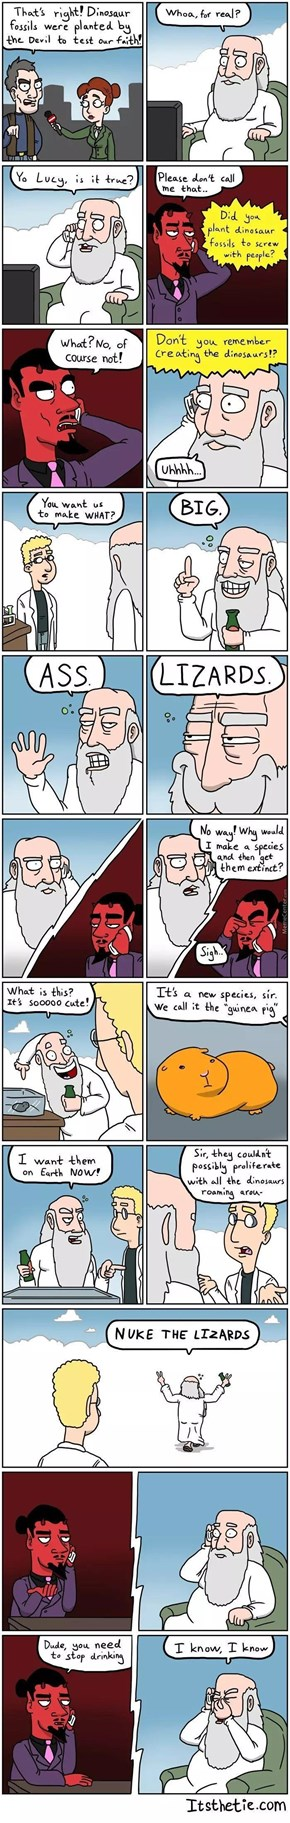 God's Drinking Problem